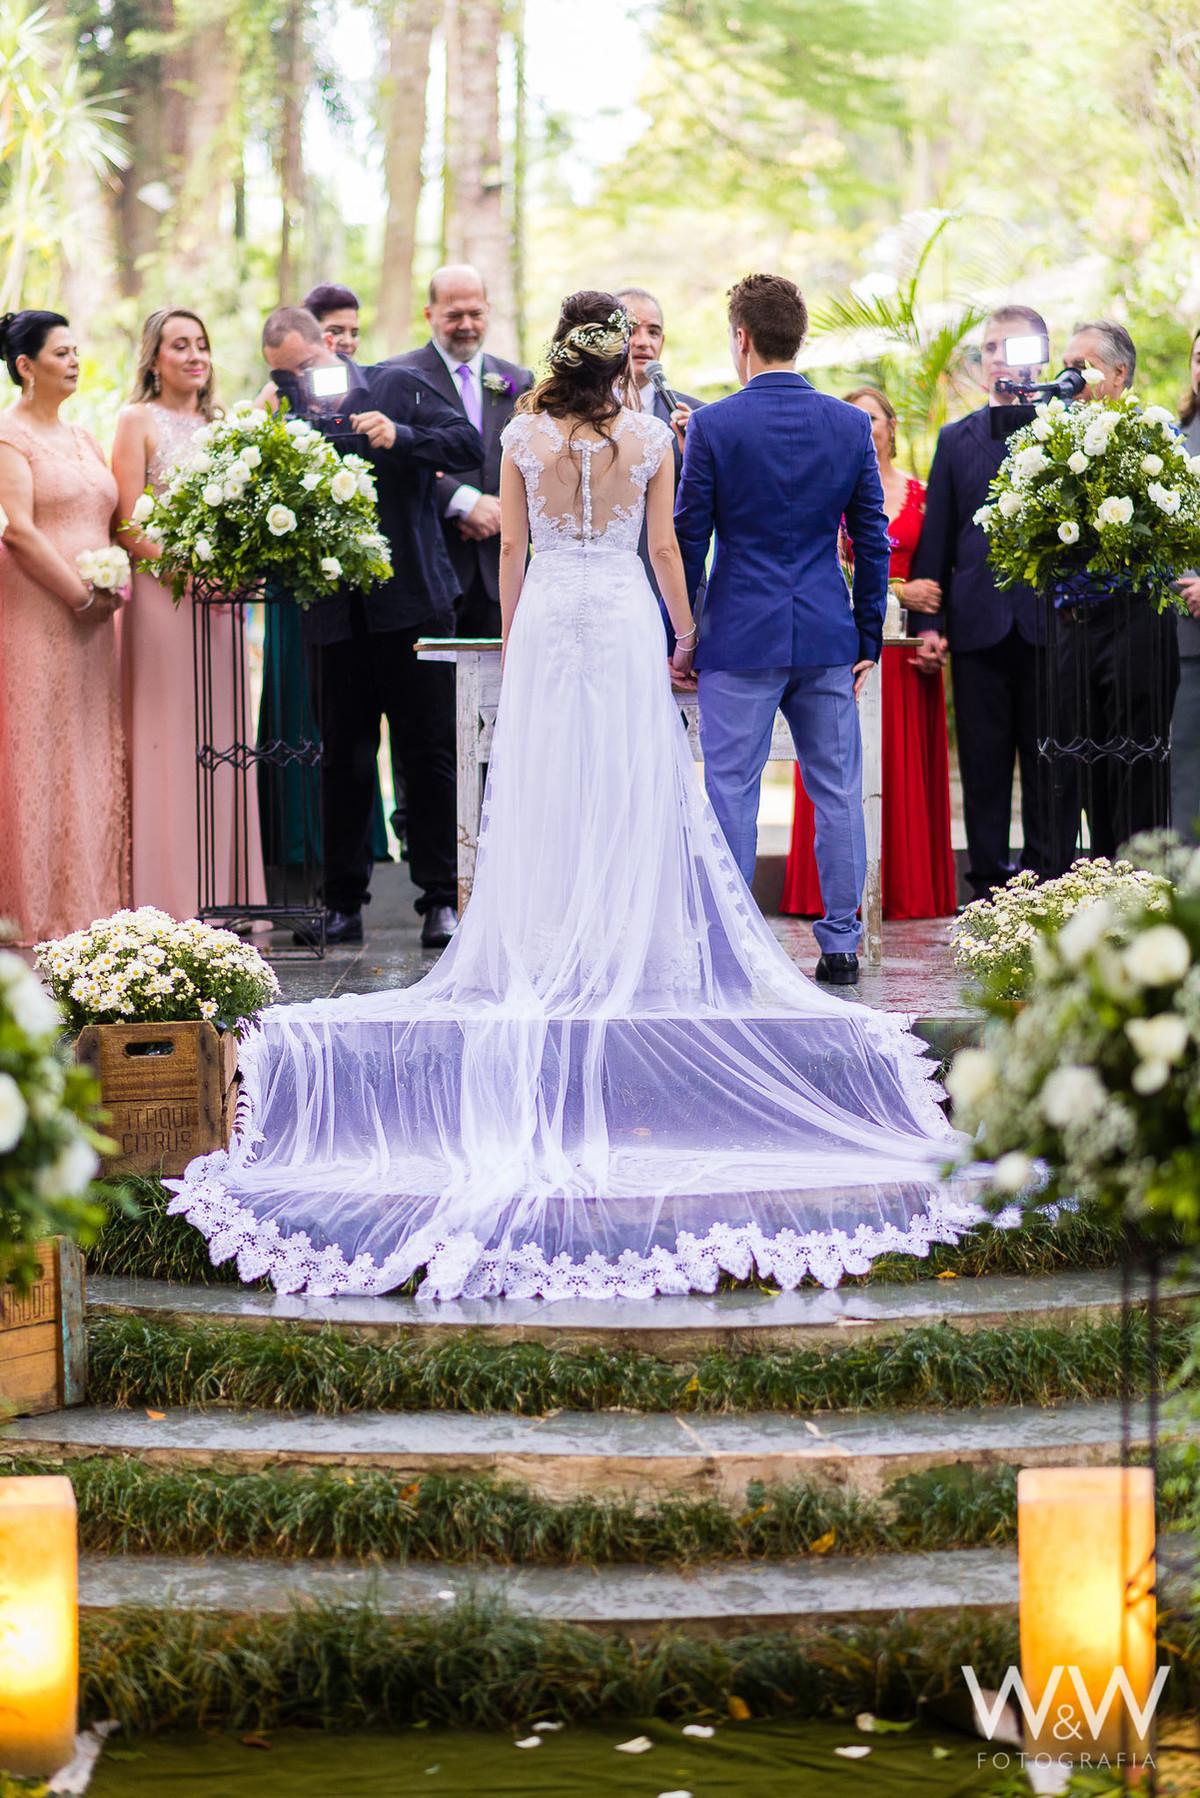 casamento itapecerica da serra mombaça park diurno wew fotografia